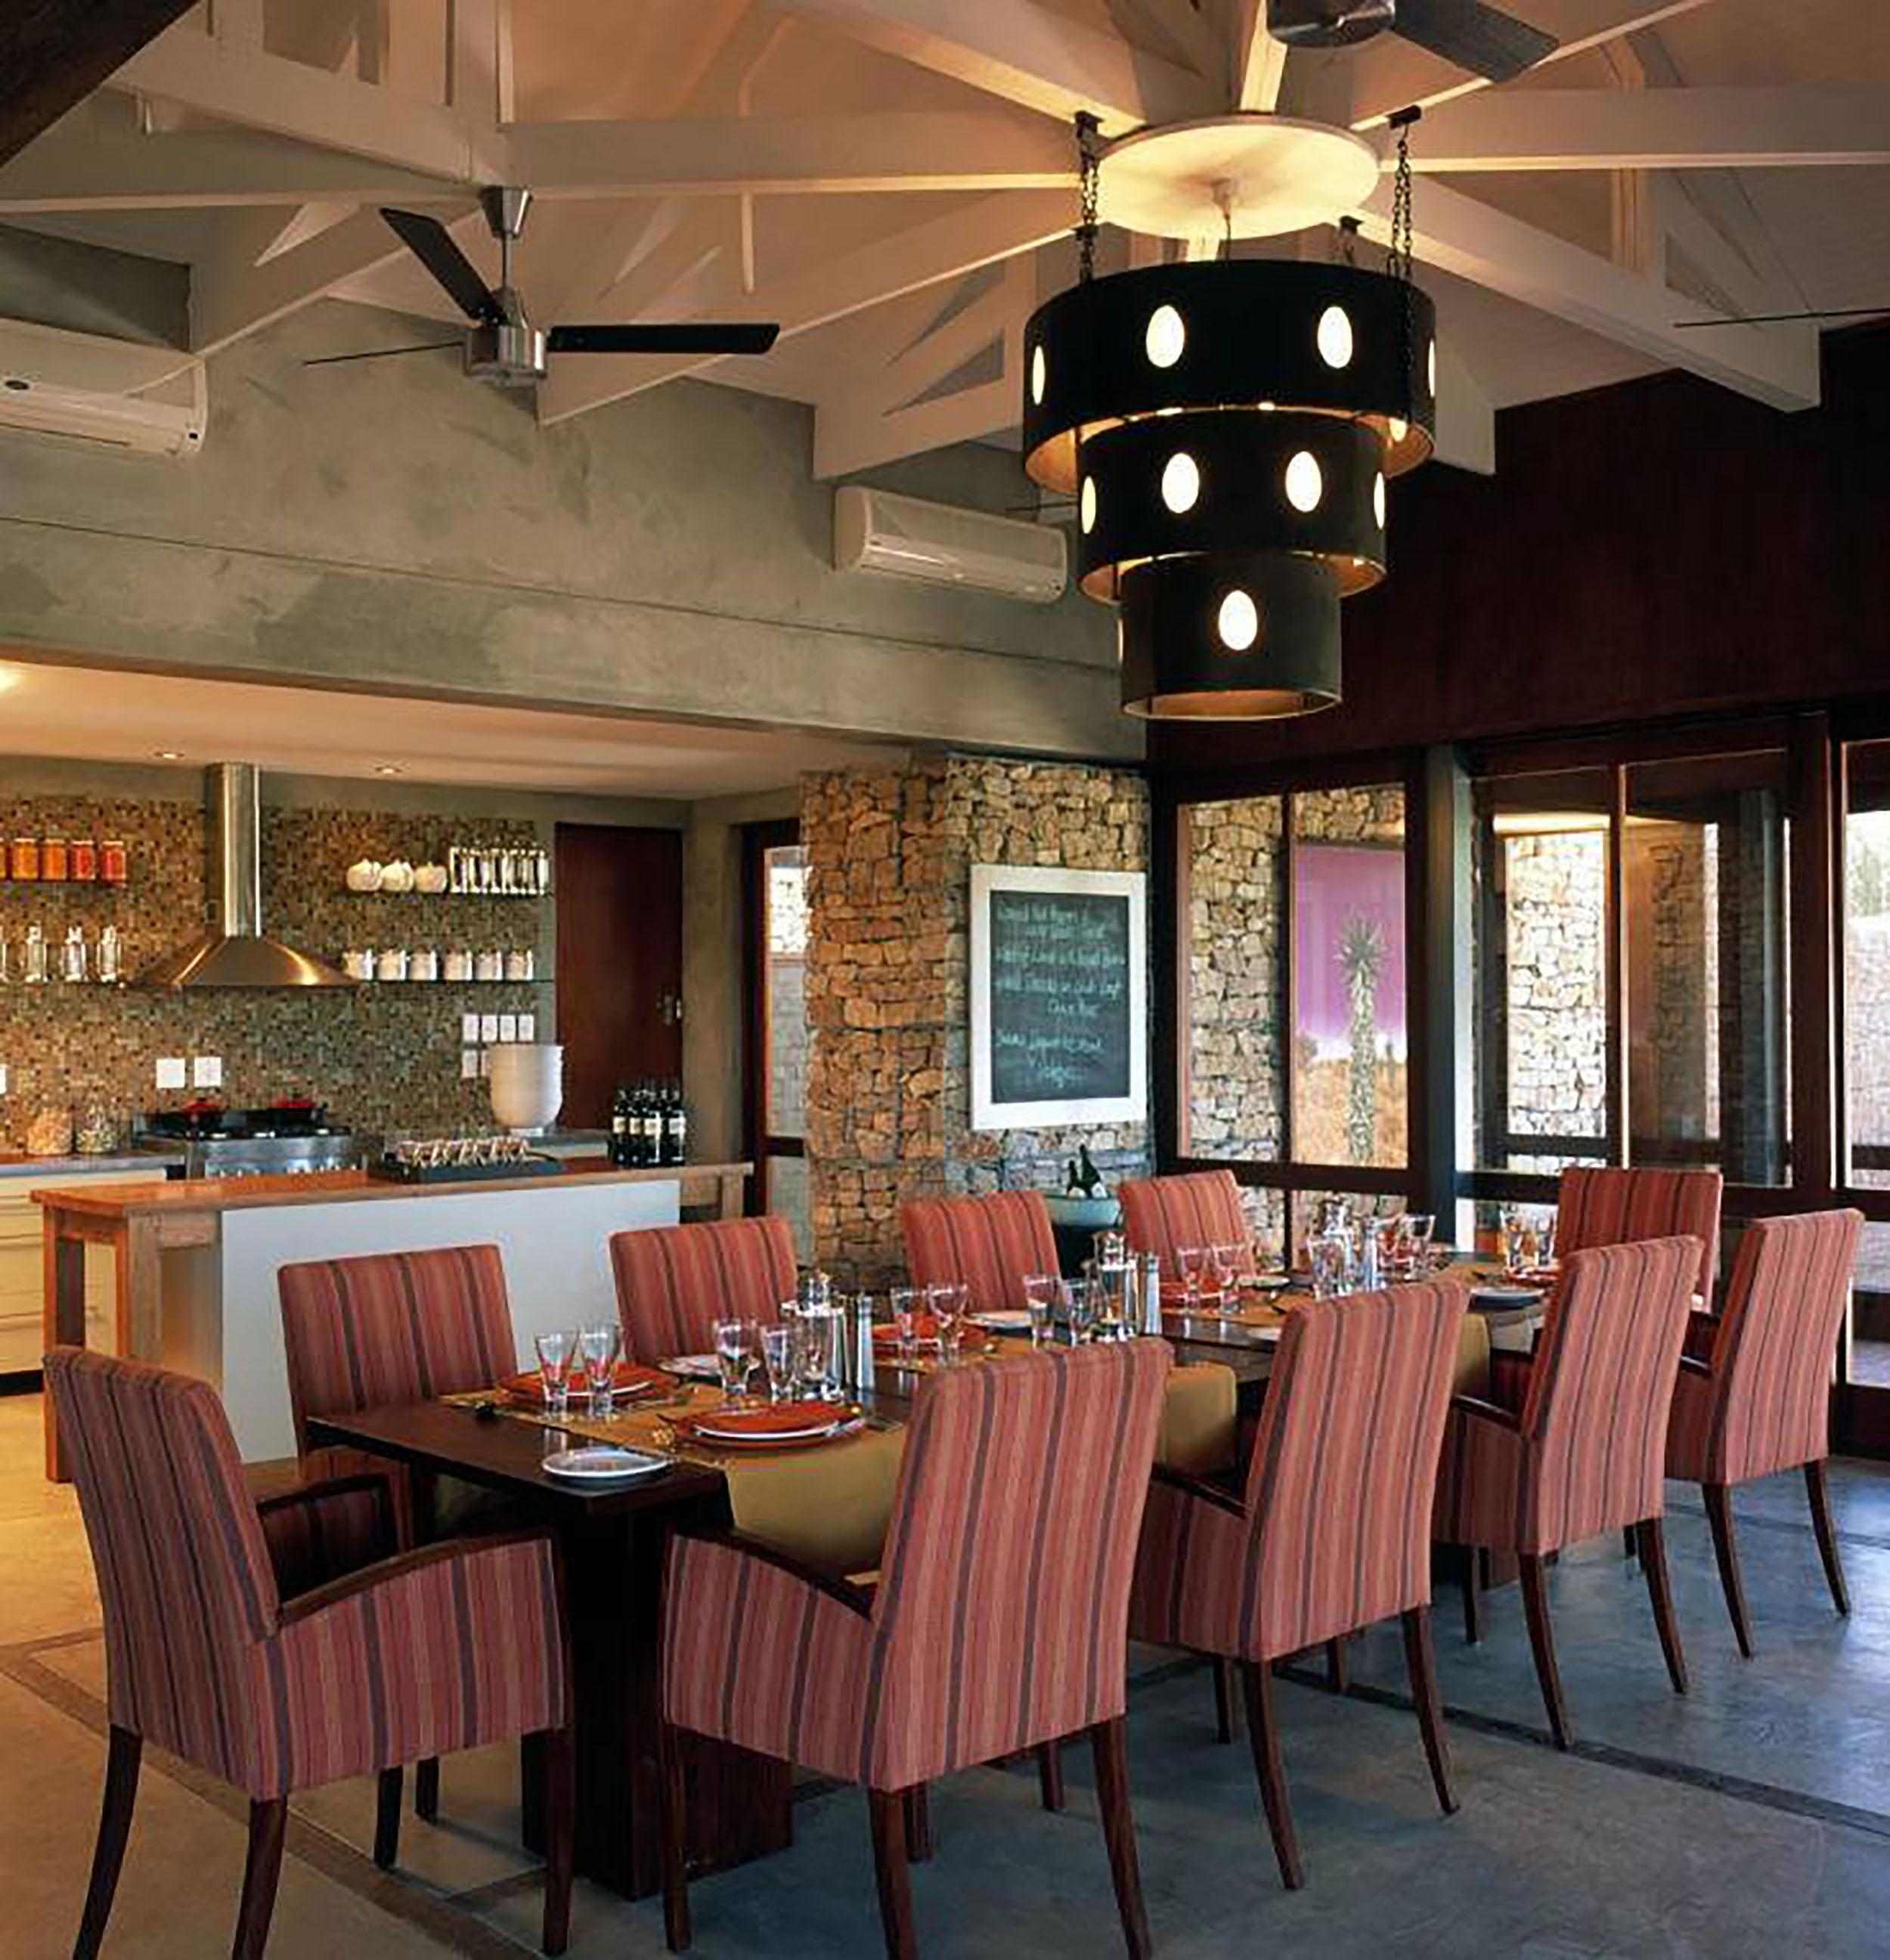 Kwandwe - Ecca - Dining room.jpg